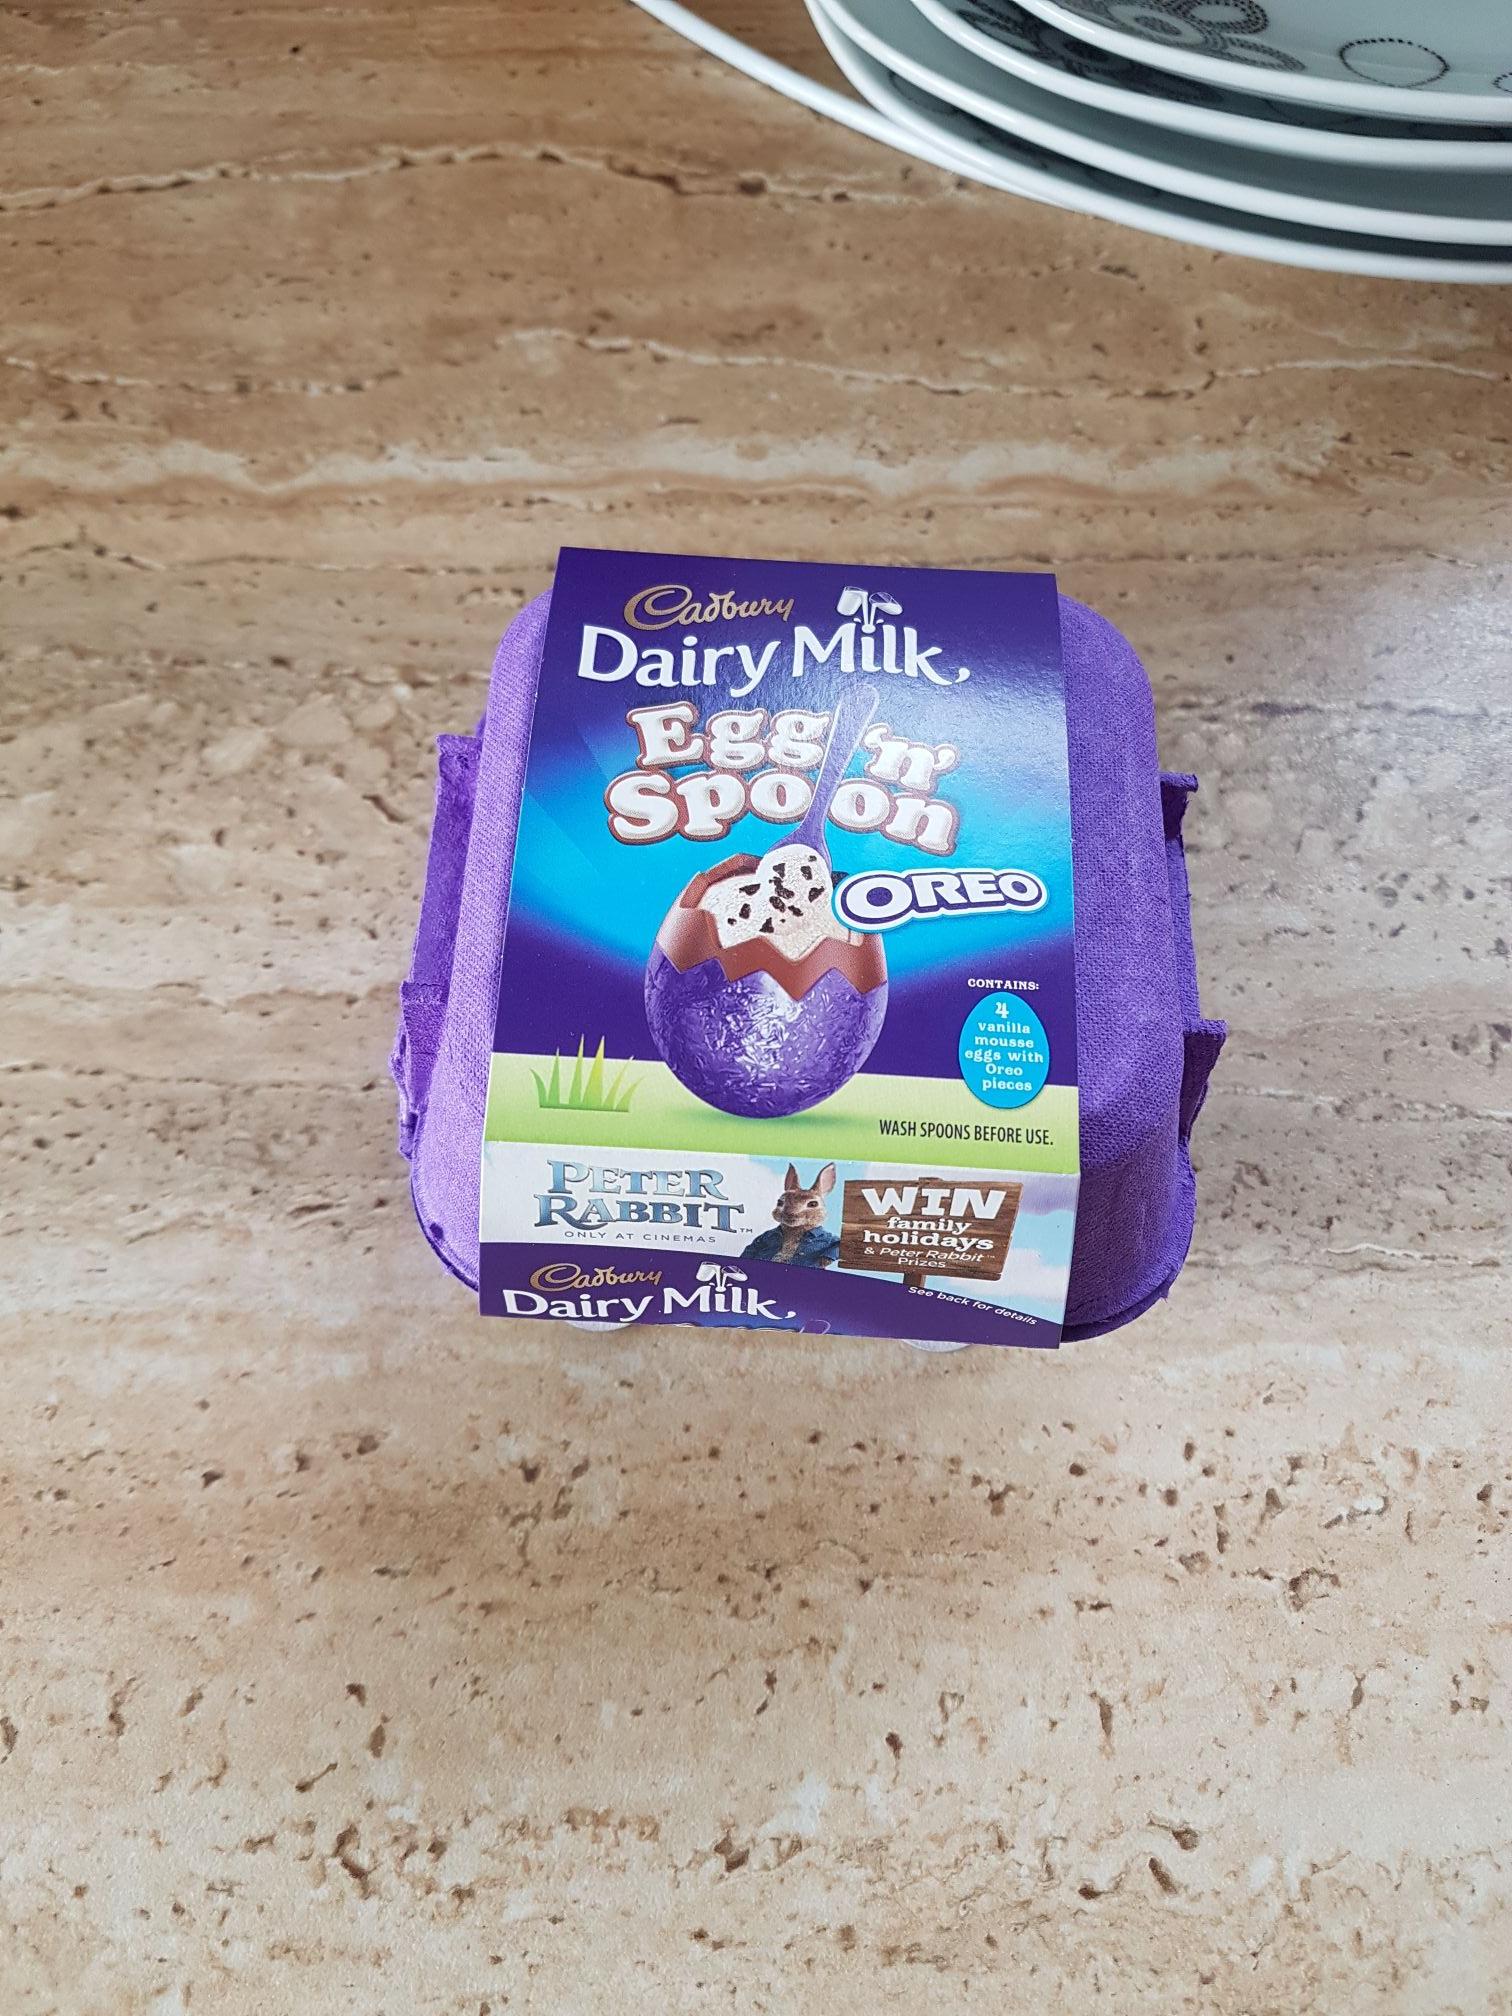 Cadburys Dairy Milk Egg 'n' Spoon Oreo instore at Sainsbury's for 68p